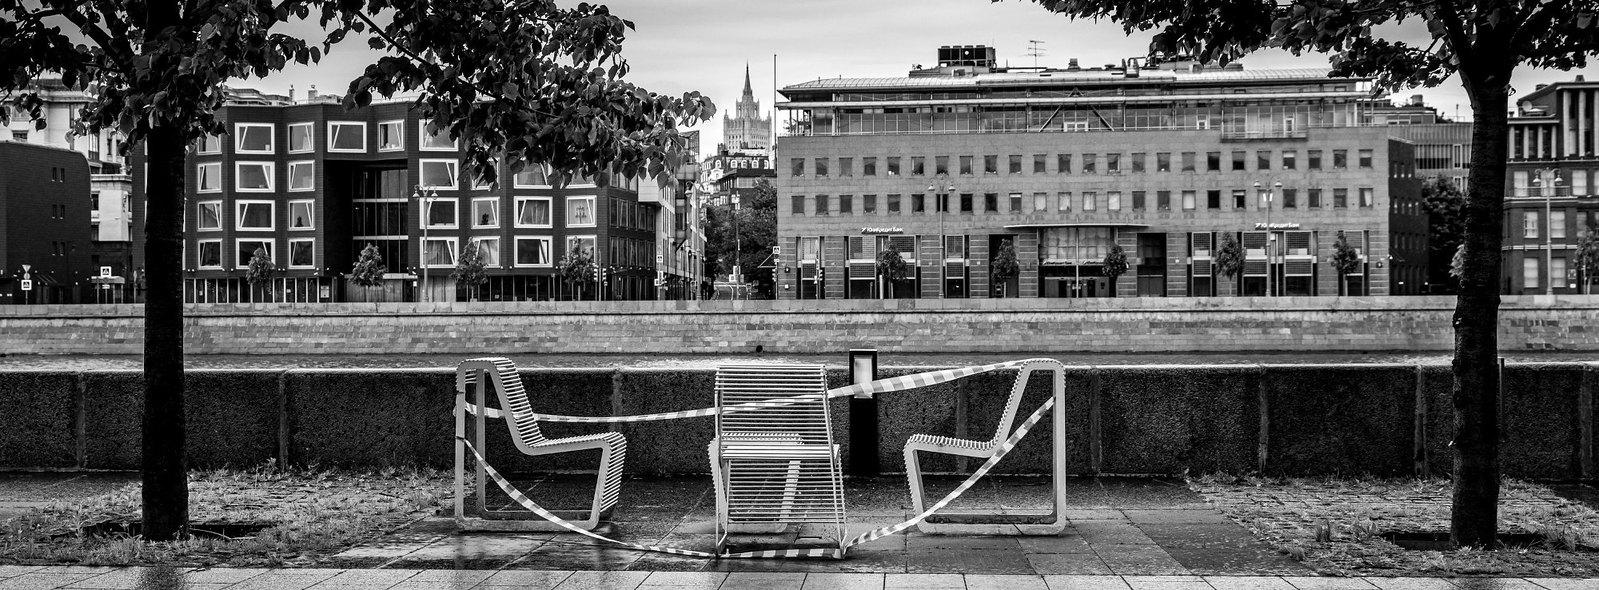 Скамейки в парке Музеон, и вид на Пречистенскую Набережную и здание МИДа